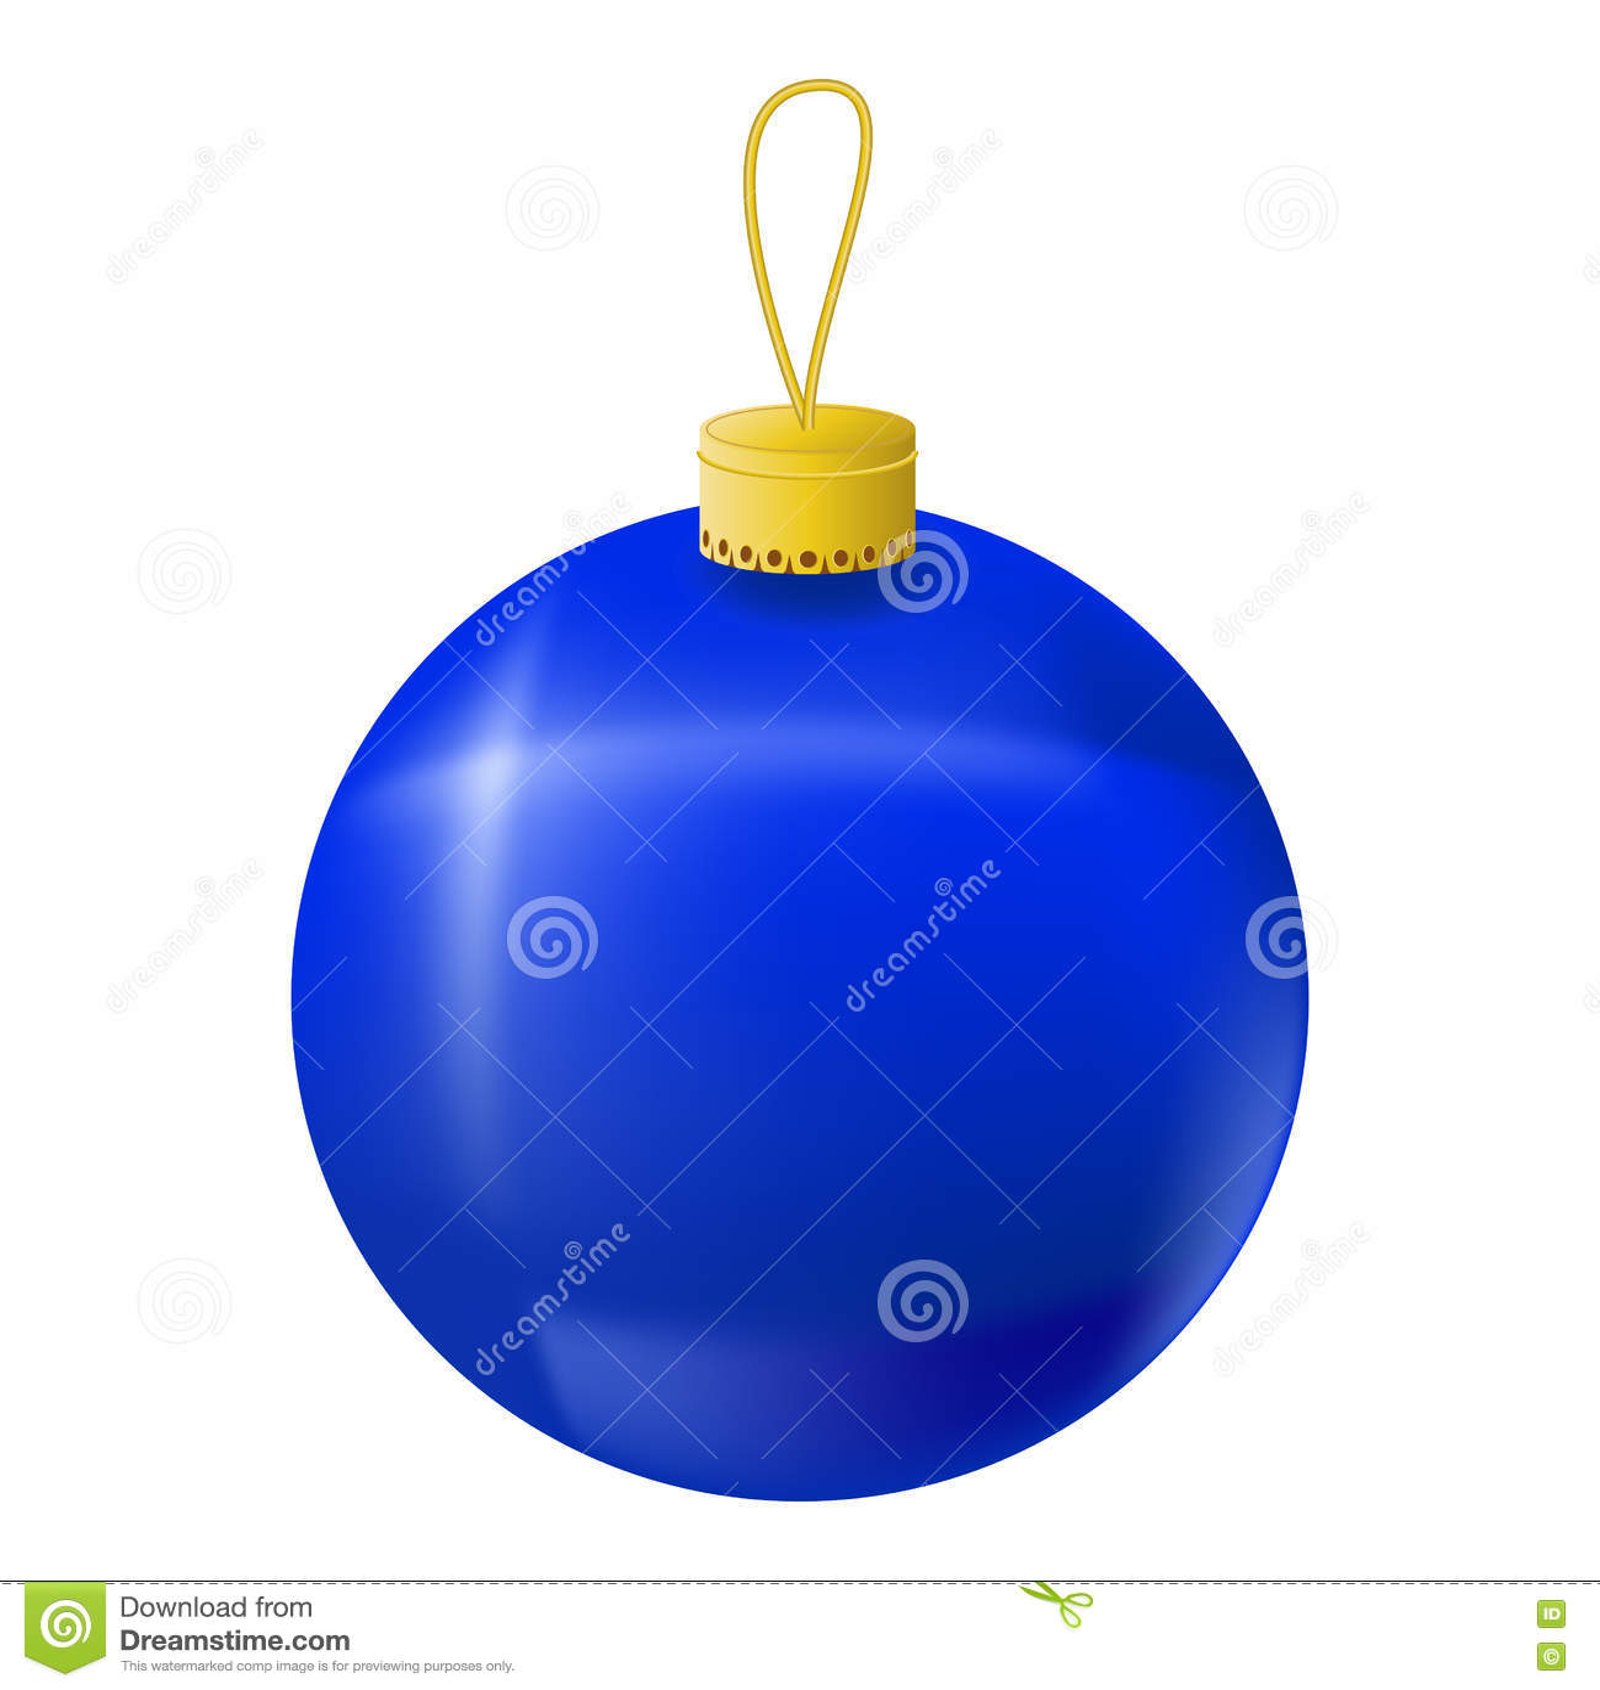 Blue Christmas Tree Ball Realistic Illustration Christmas Fir Tree